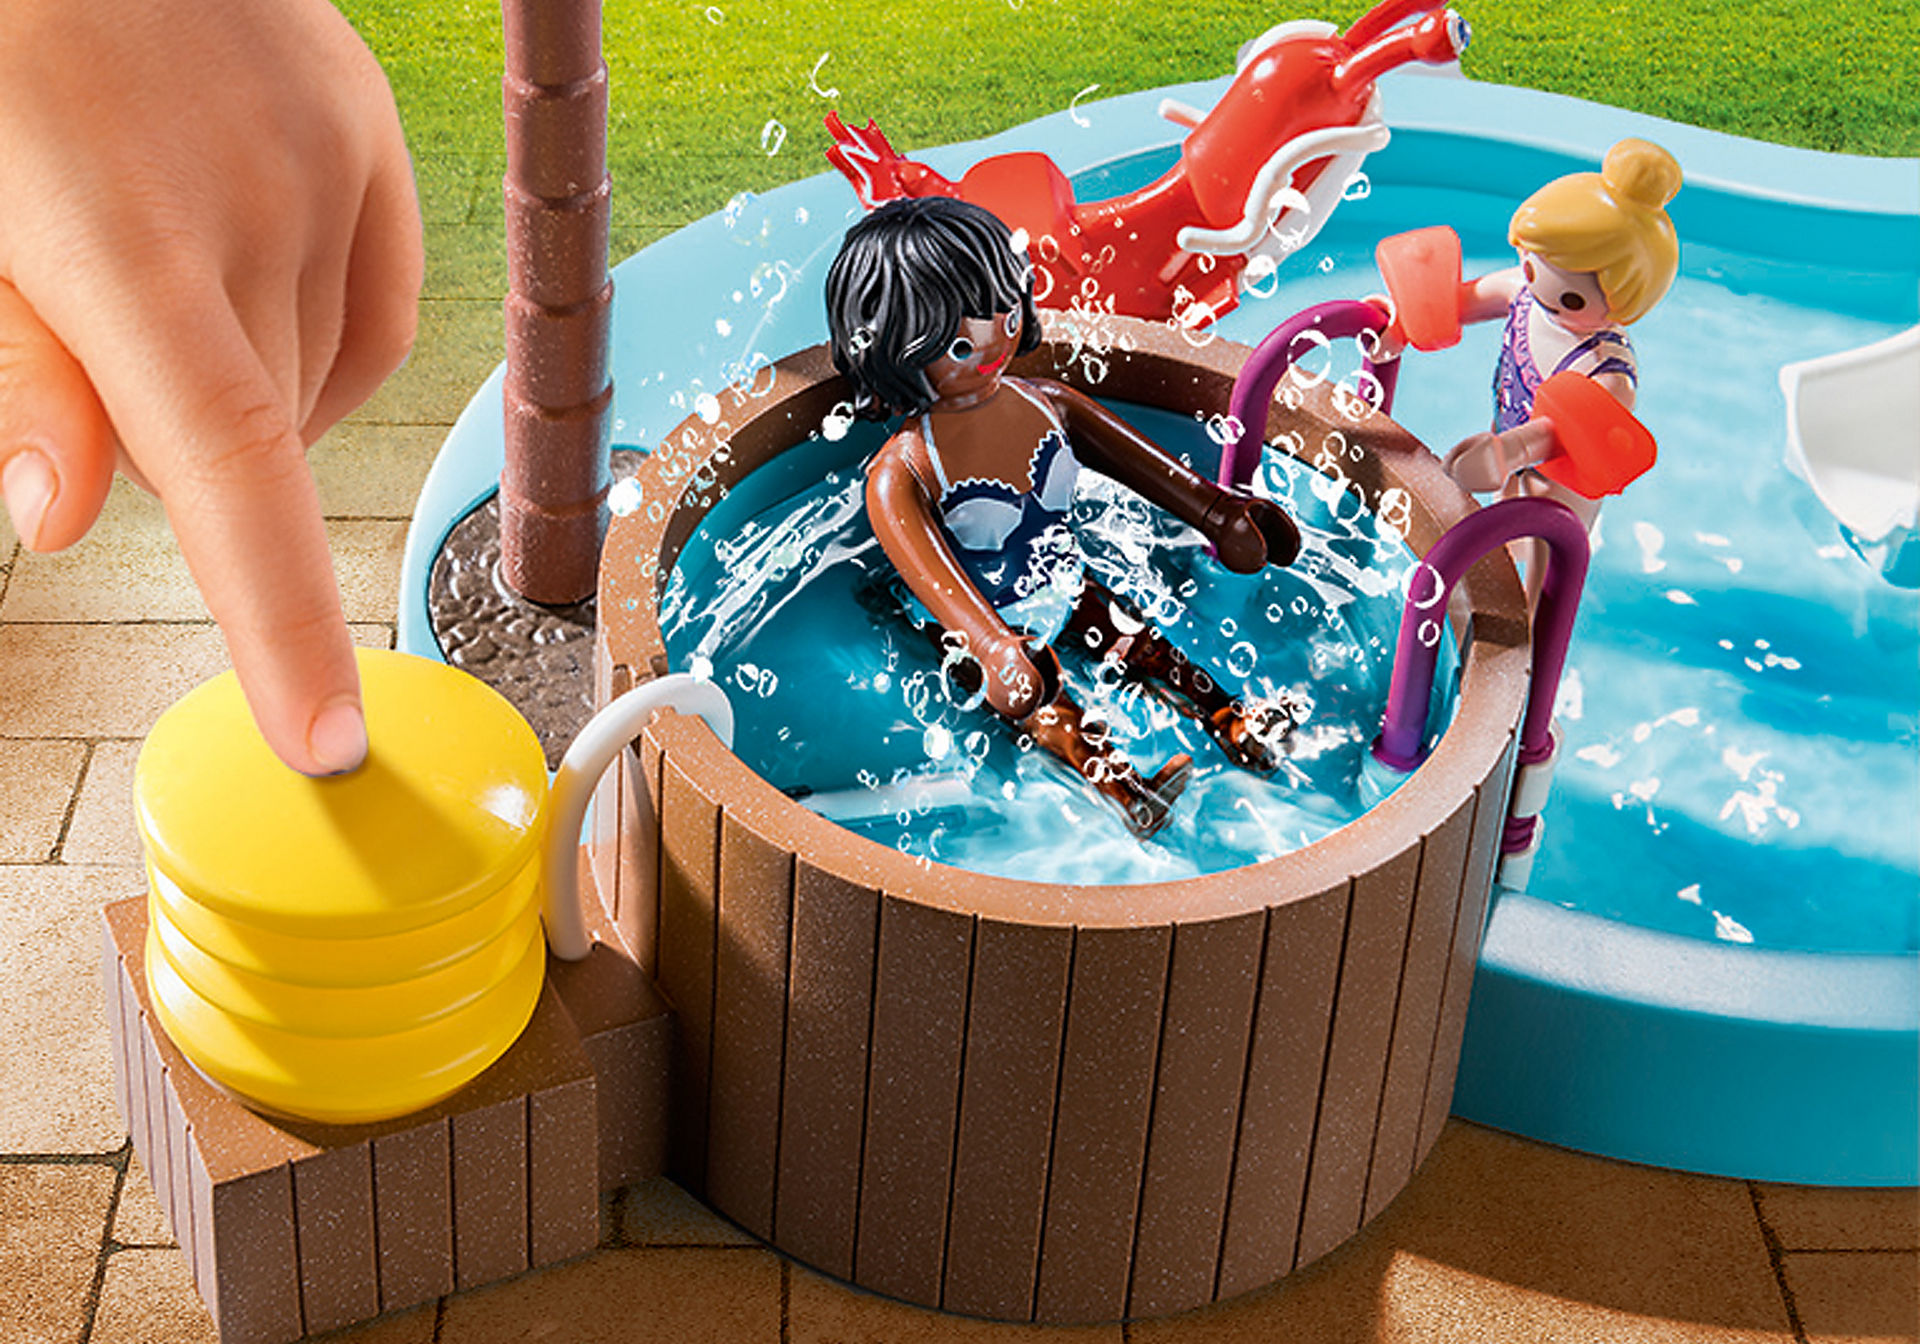 70611 Kinderzwembad met whirlpool zoom image4